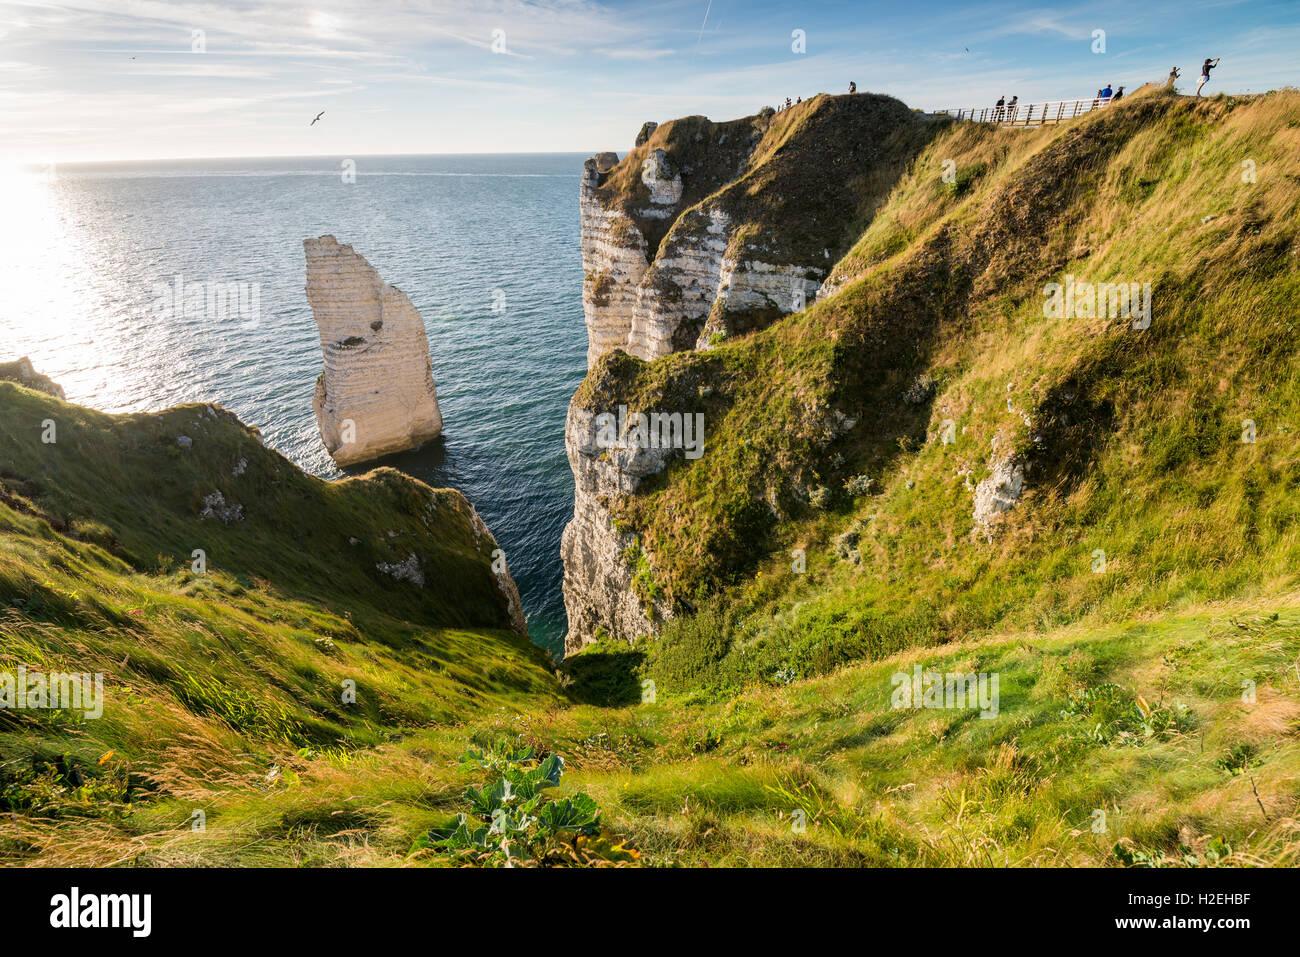 The cliffs of Etretat on the Normandy coast, France, EU, Europe - Stock Image